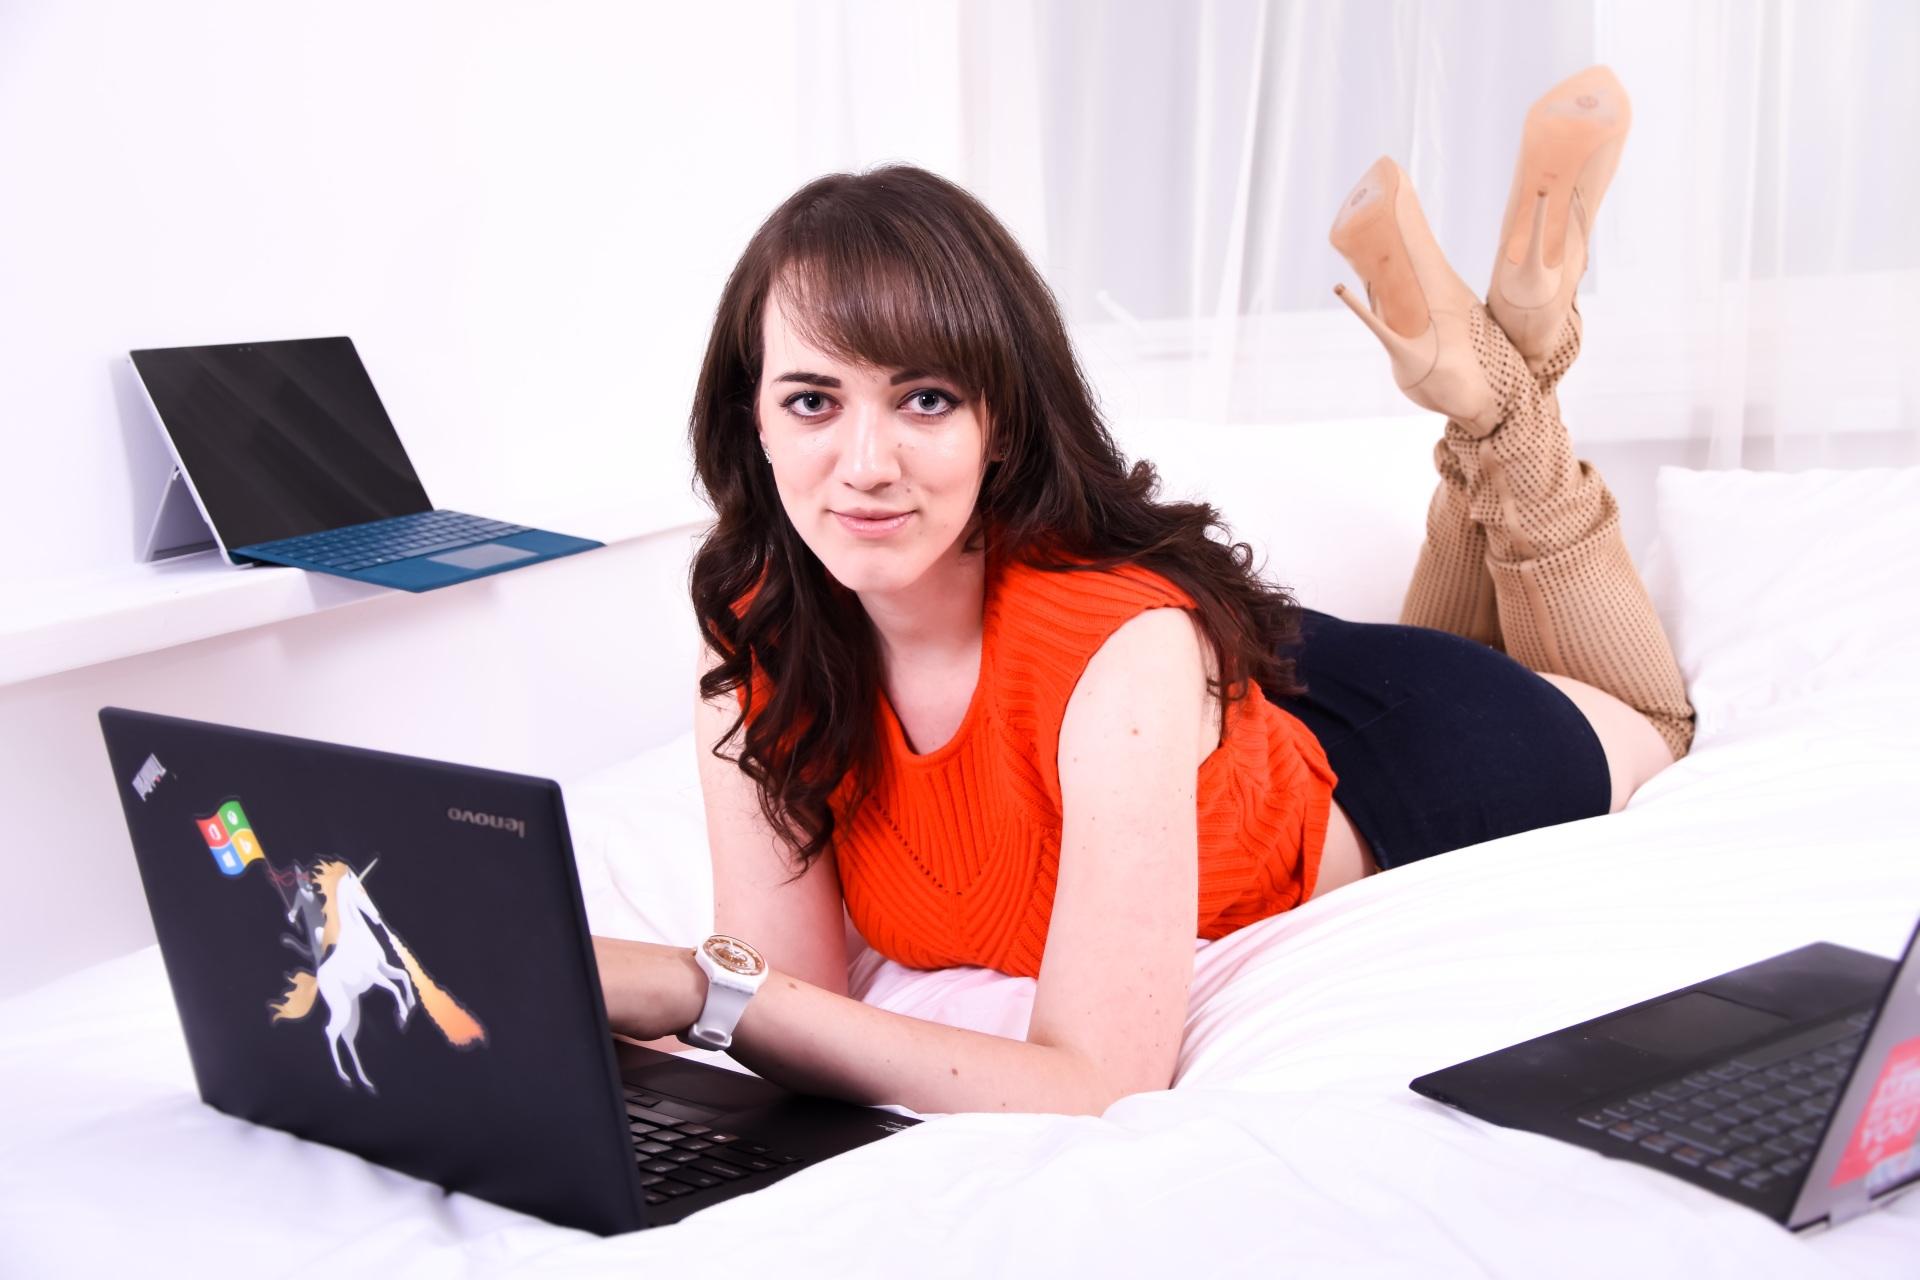 trendy_techie_sage_franch_mateo_yorke_photopathic_orange_glamour_4